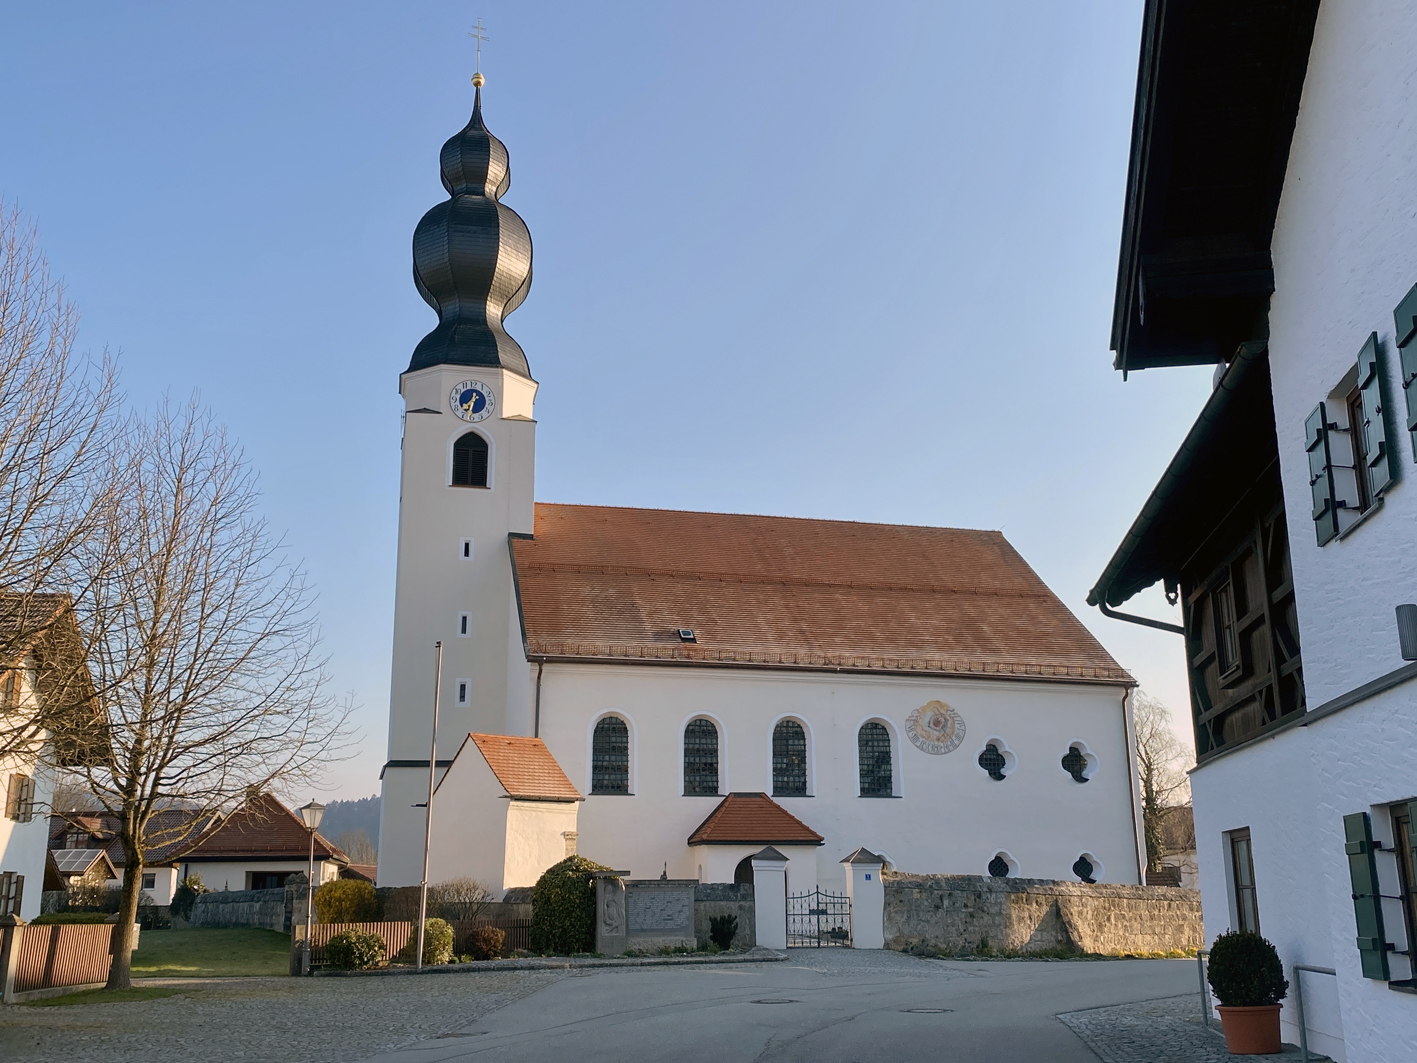 2021 05 17 aoelfb niedergottsau kirche mariae himmelfahrt aussen1